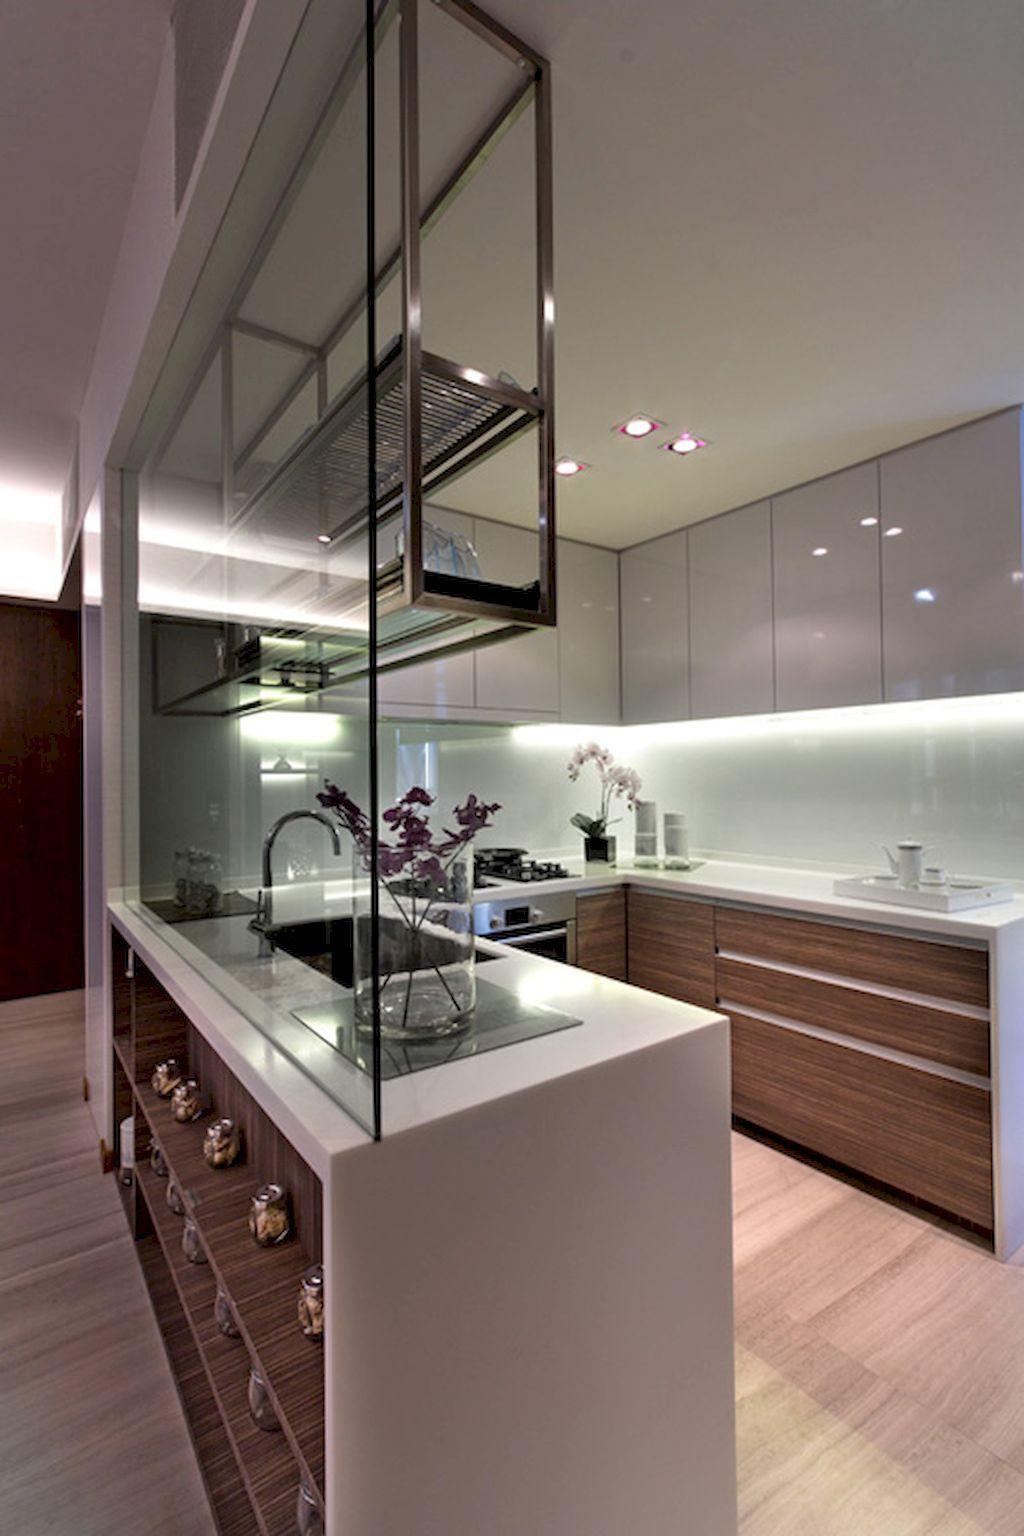 Adorable 142 Modern Glass Wall Interior Design Ideas https